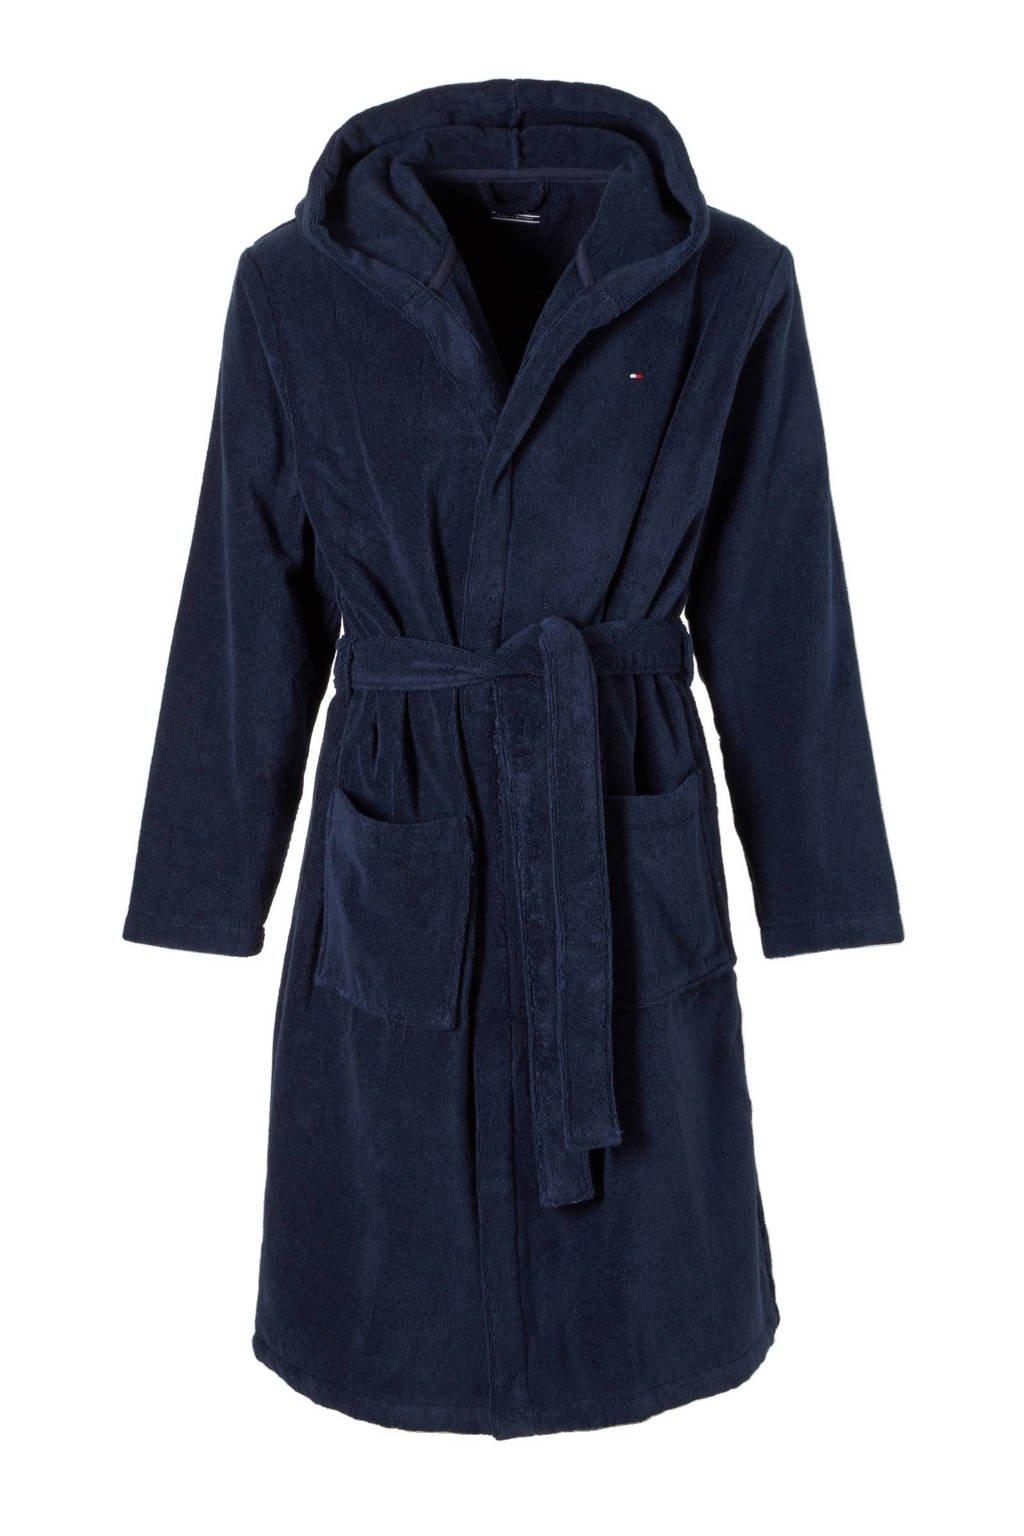 Tommy Hilfiger badstof badjas met capuchon marine, Donkerblauw